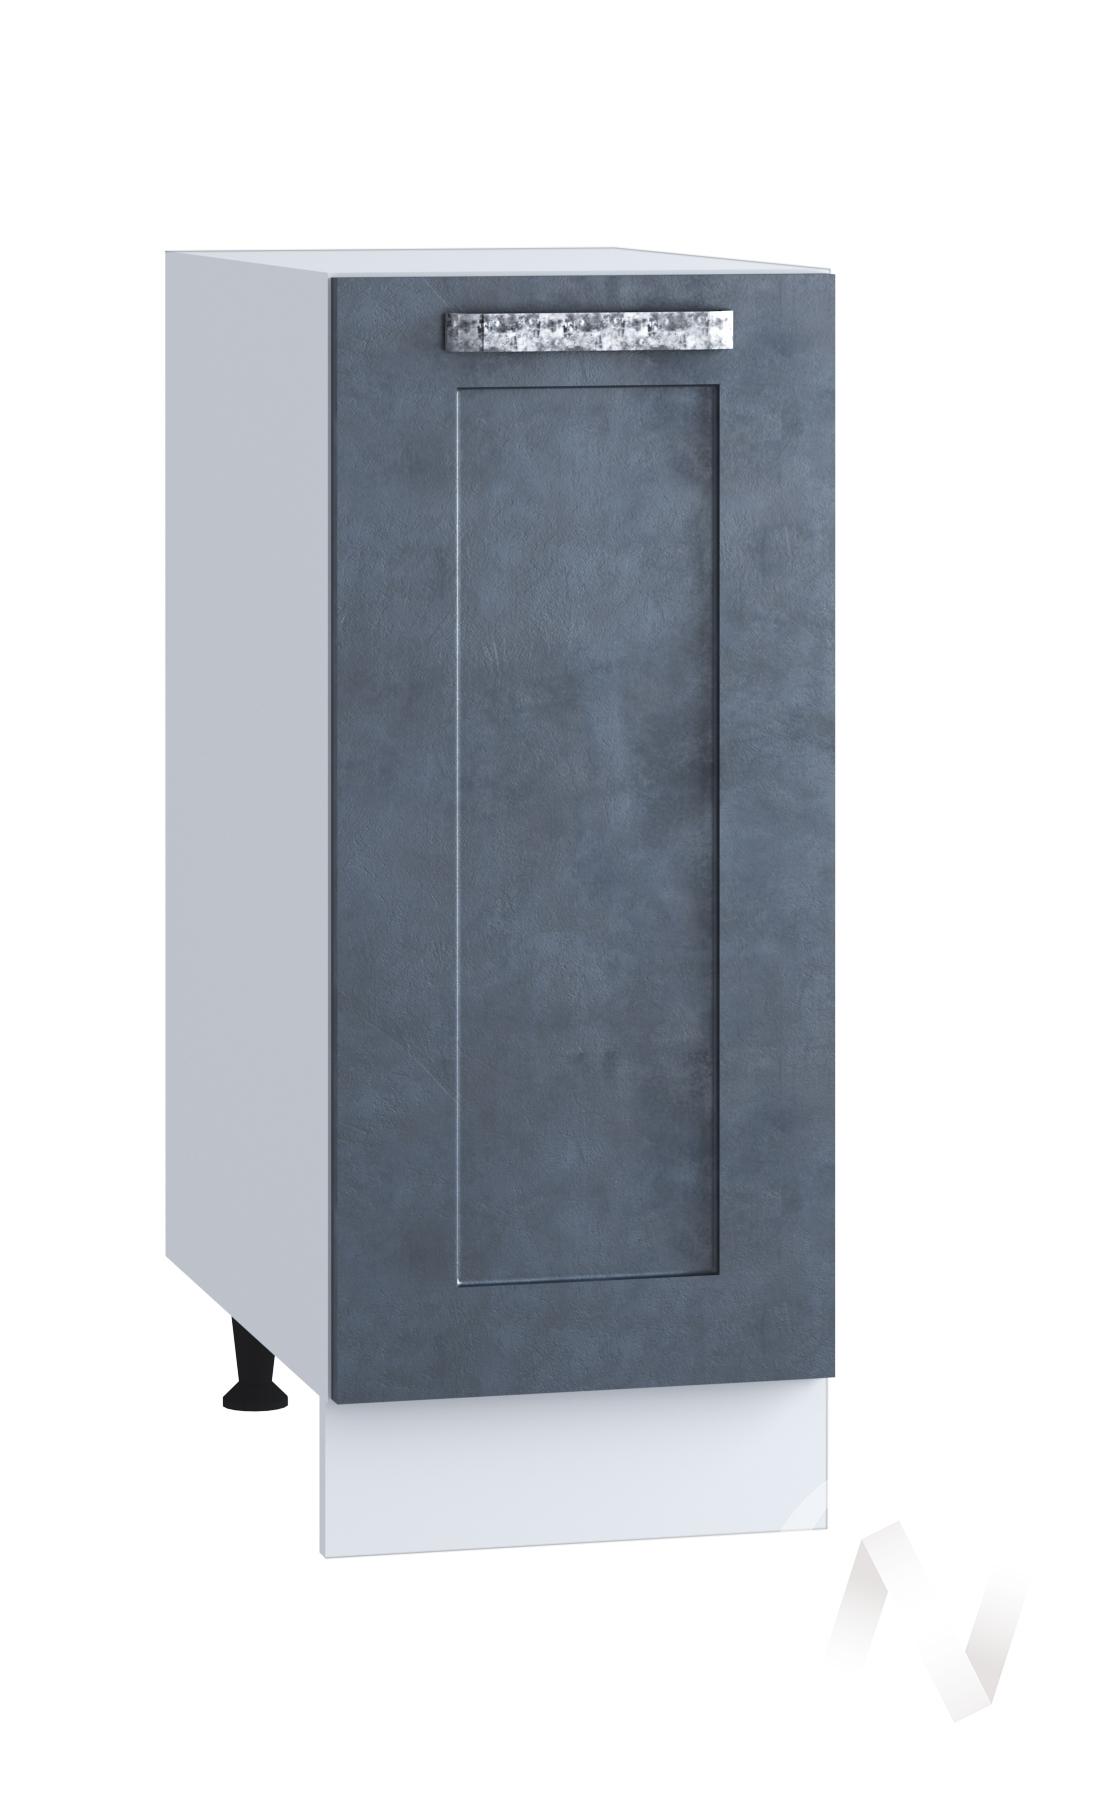 "Кухня ""Лофт"": Шкаф нижний 300, ШН 300 (Бетон графит/корпус белый)"